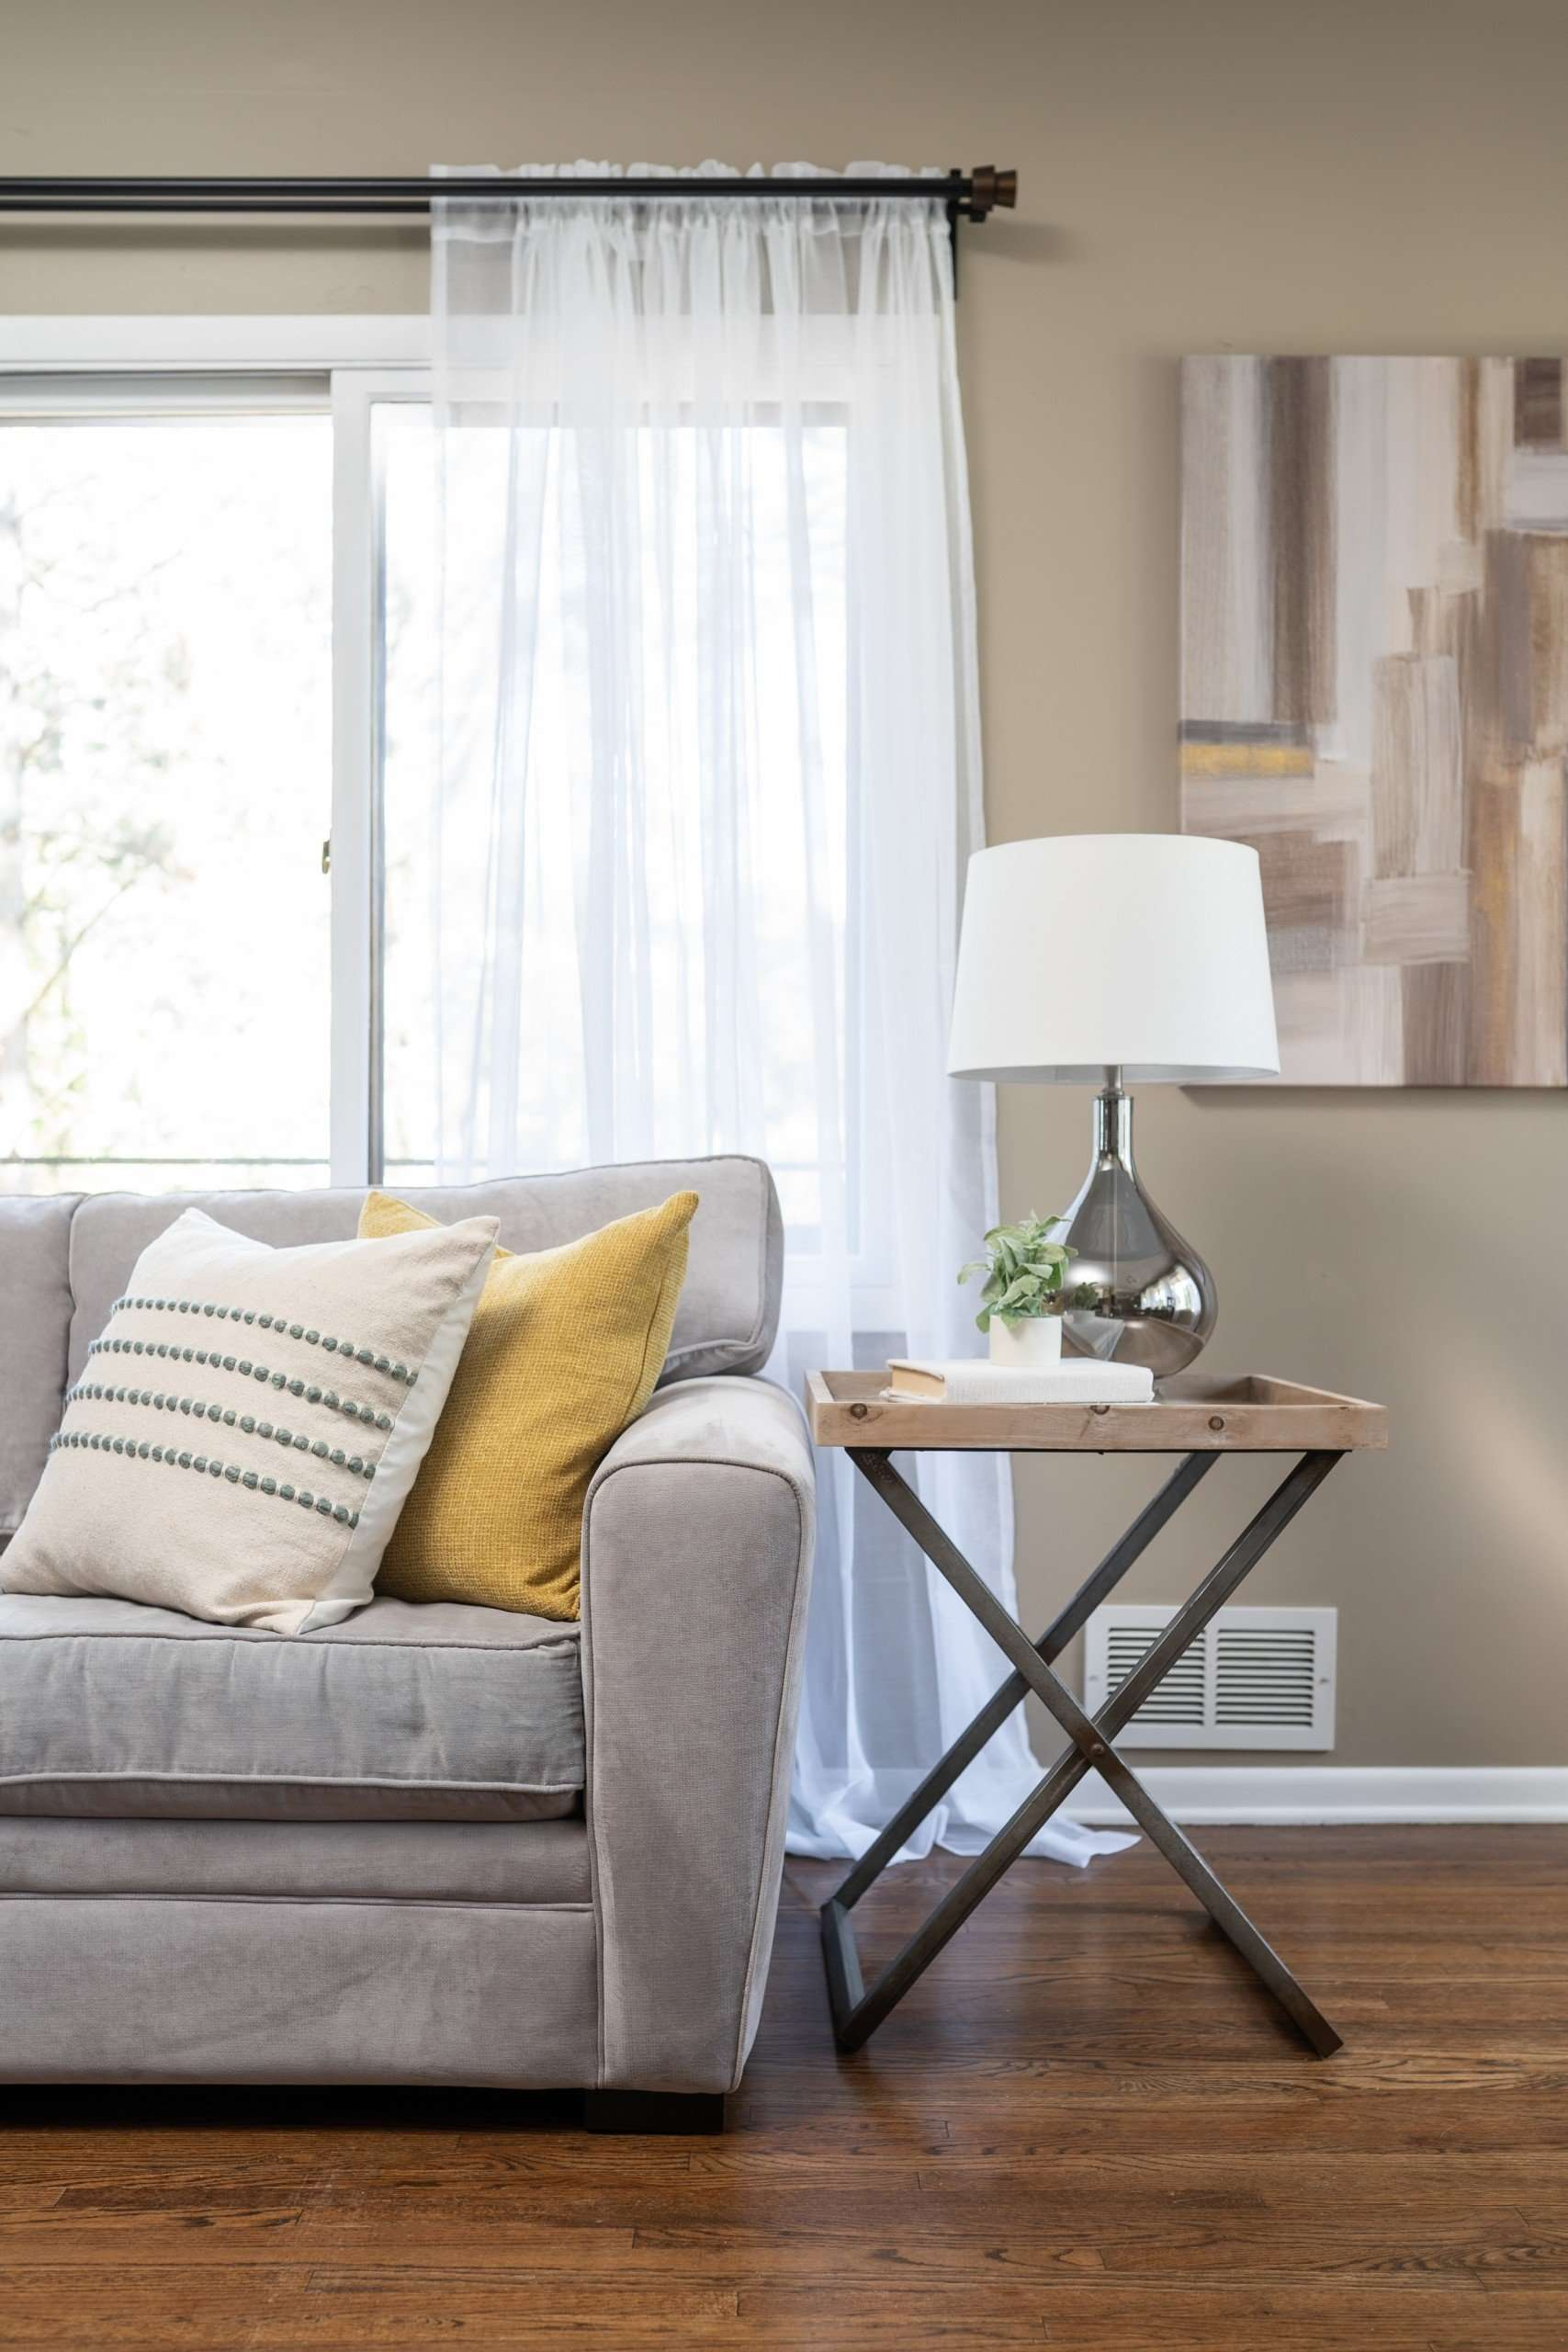 Living Room | Vacant Home | St. Paul | Minnesota